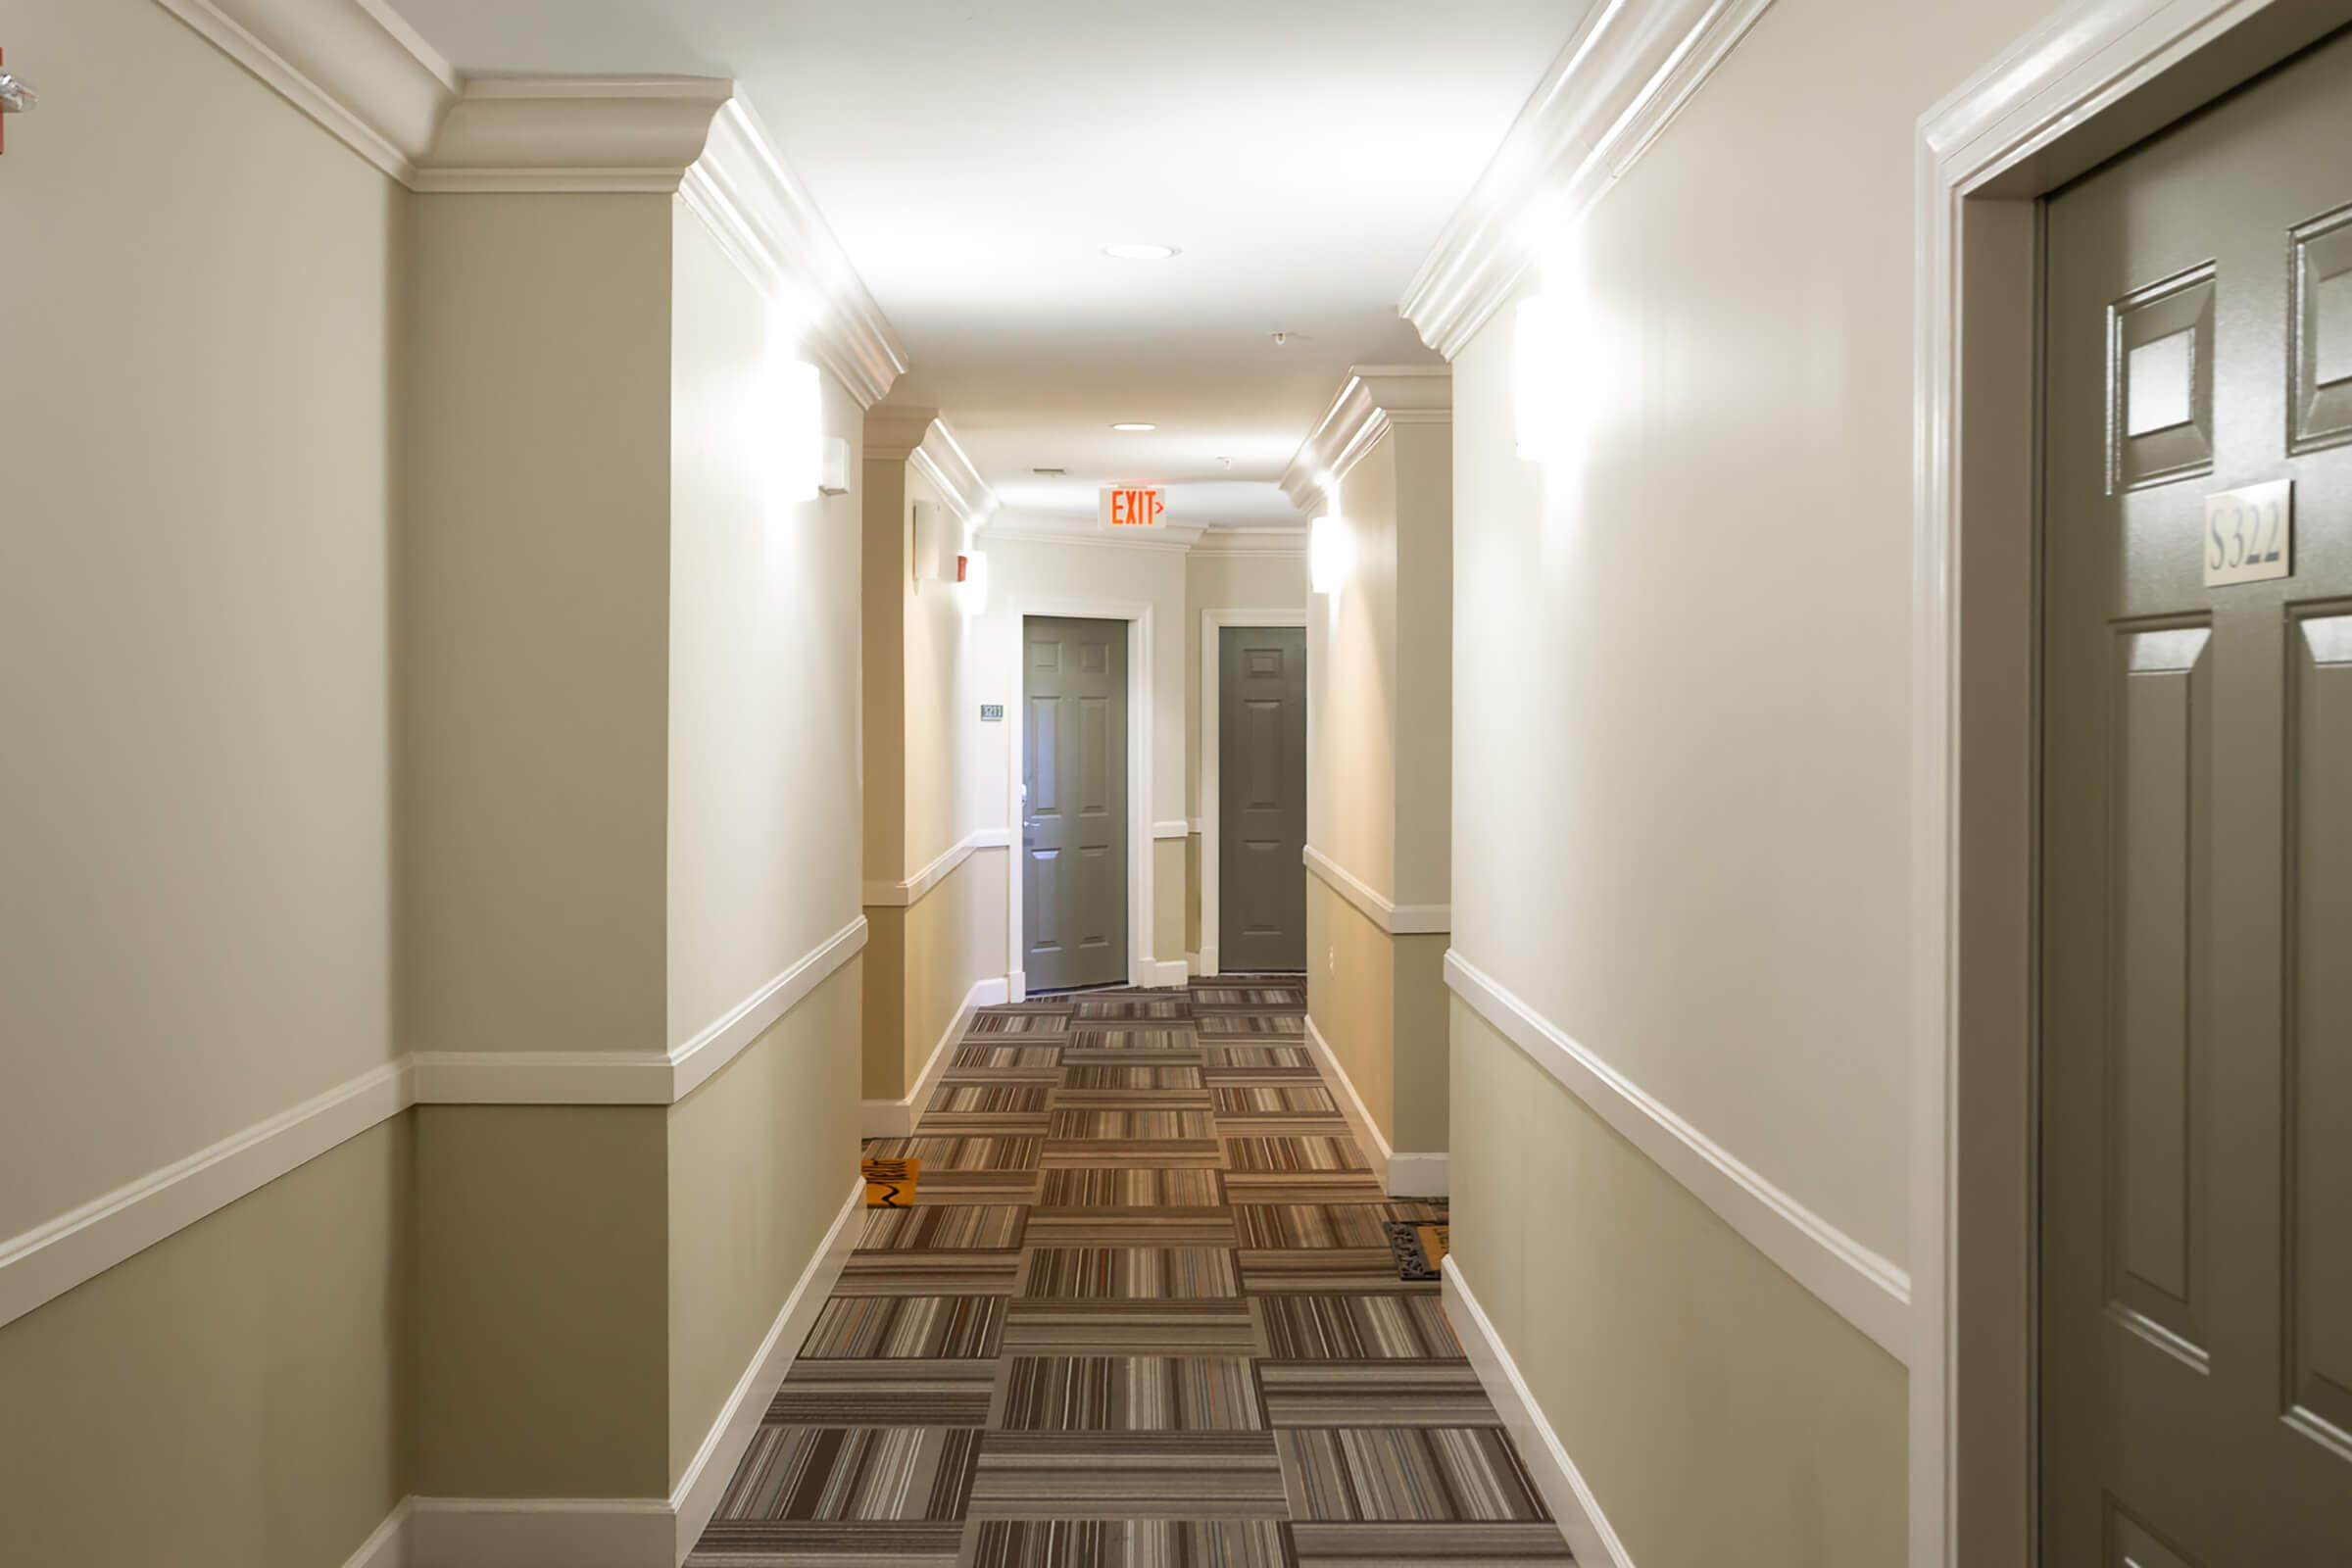 Hallway at The Rothbury in Gaithersburg, MD